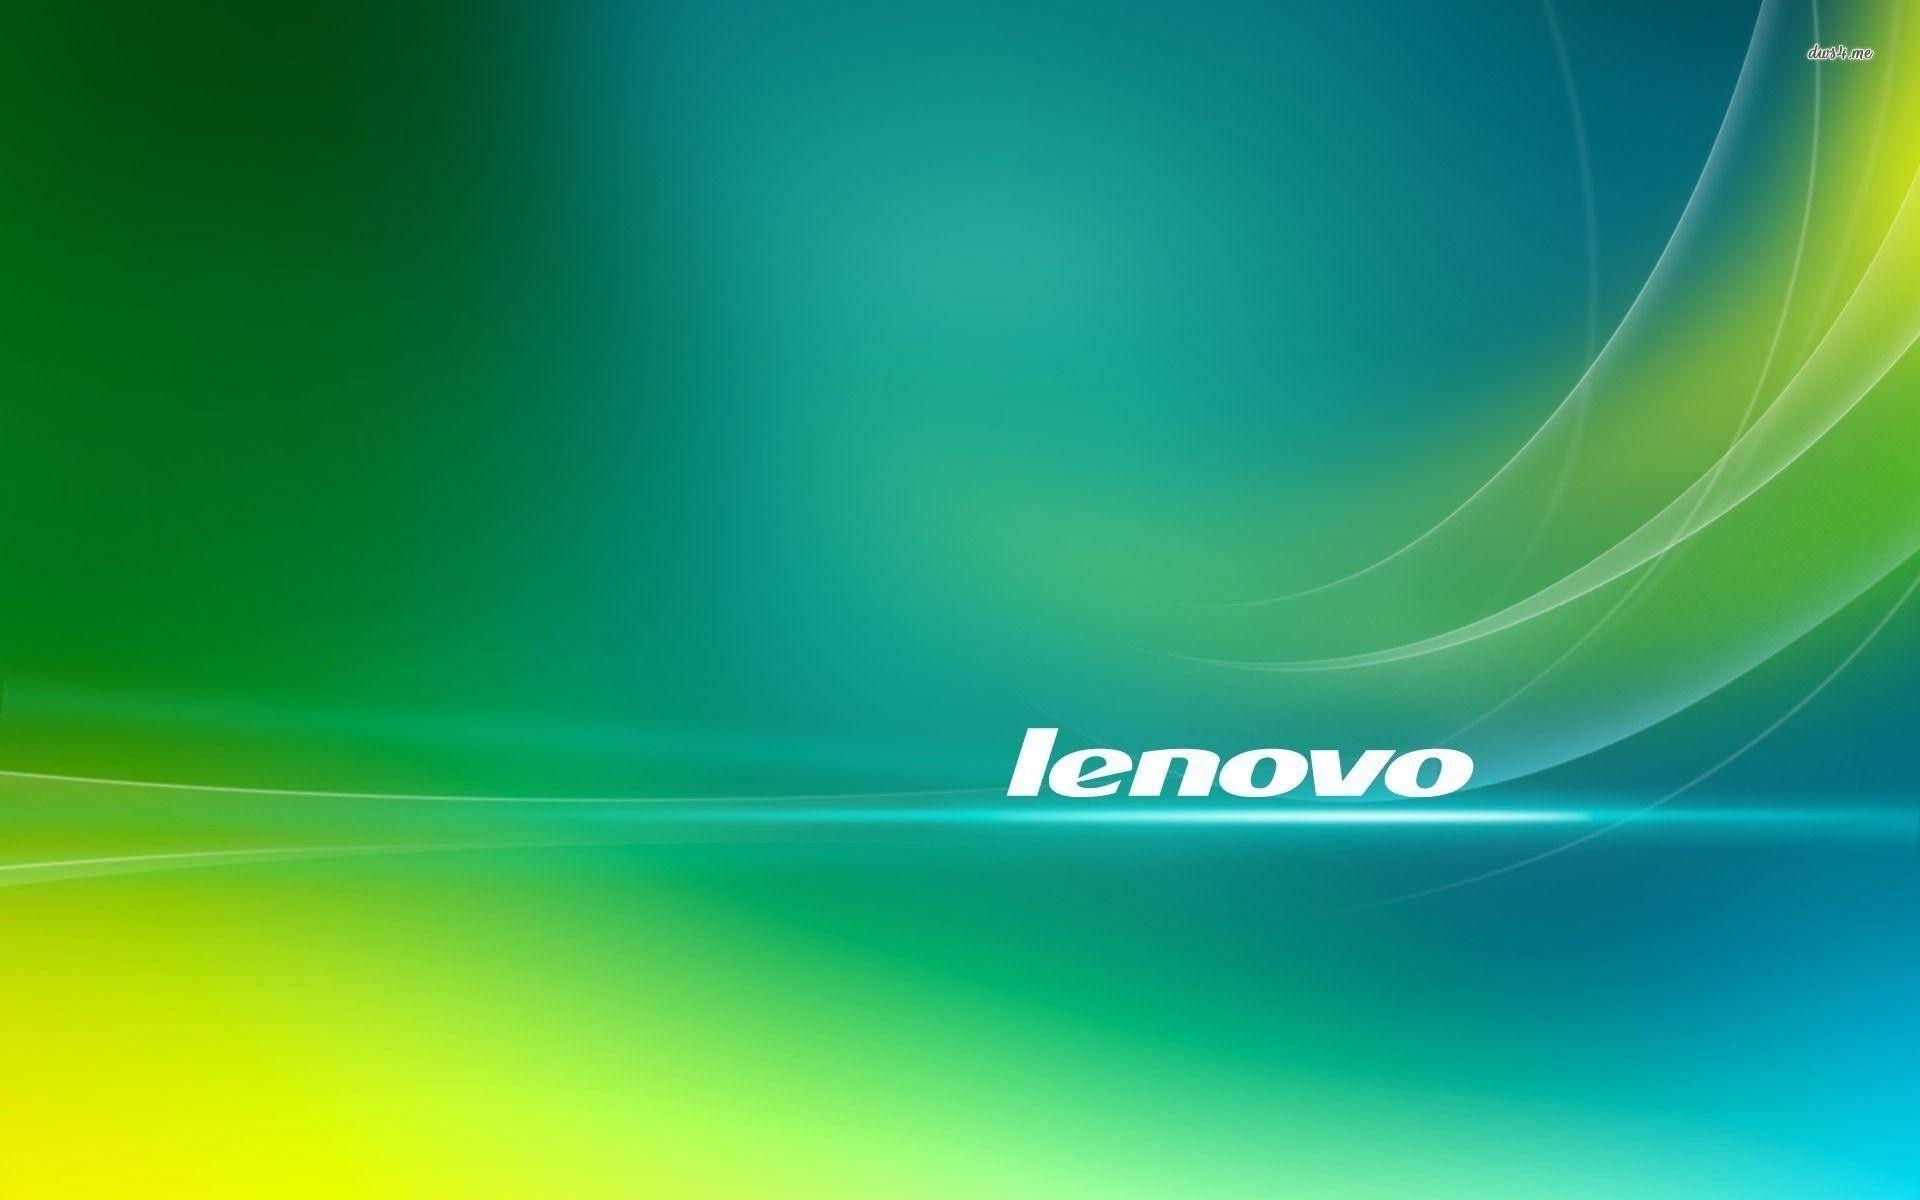 Best Lenovo Wallpaper Full Hd Di 2020 Dengan Gambar